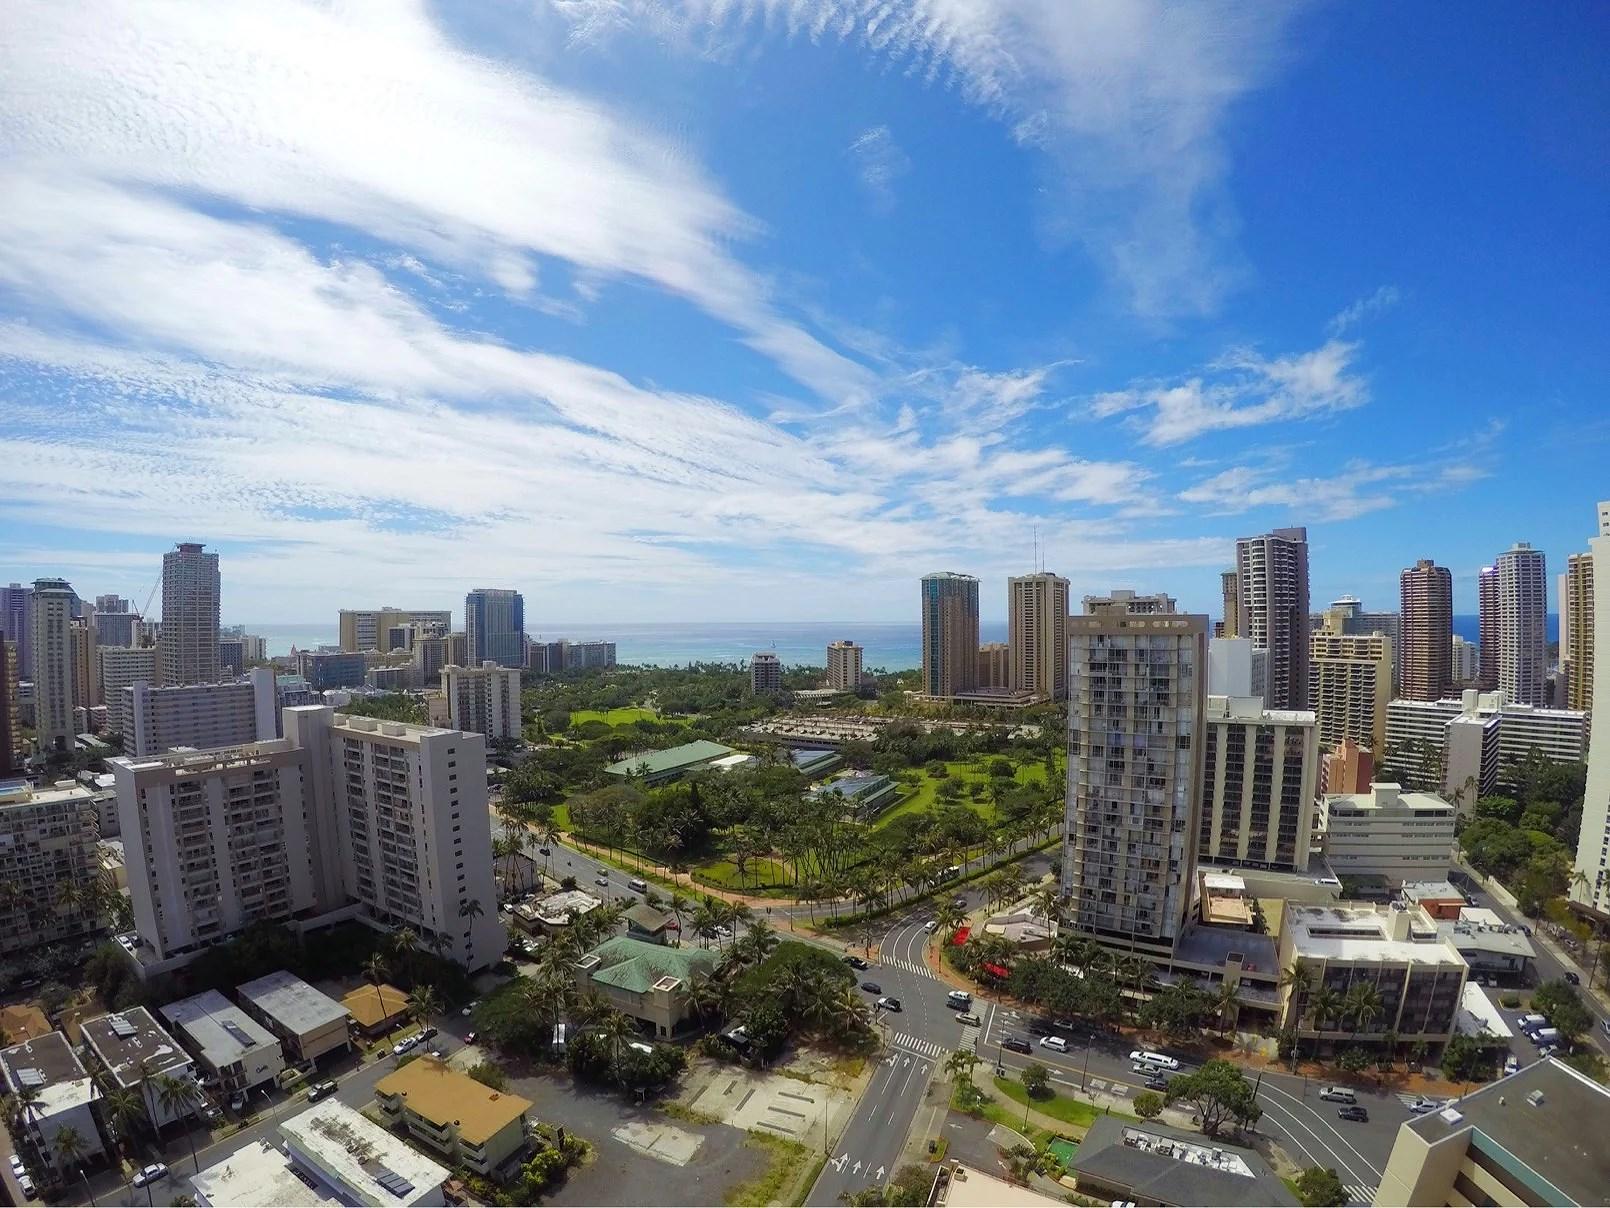 Hänger i Honolulu